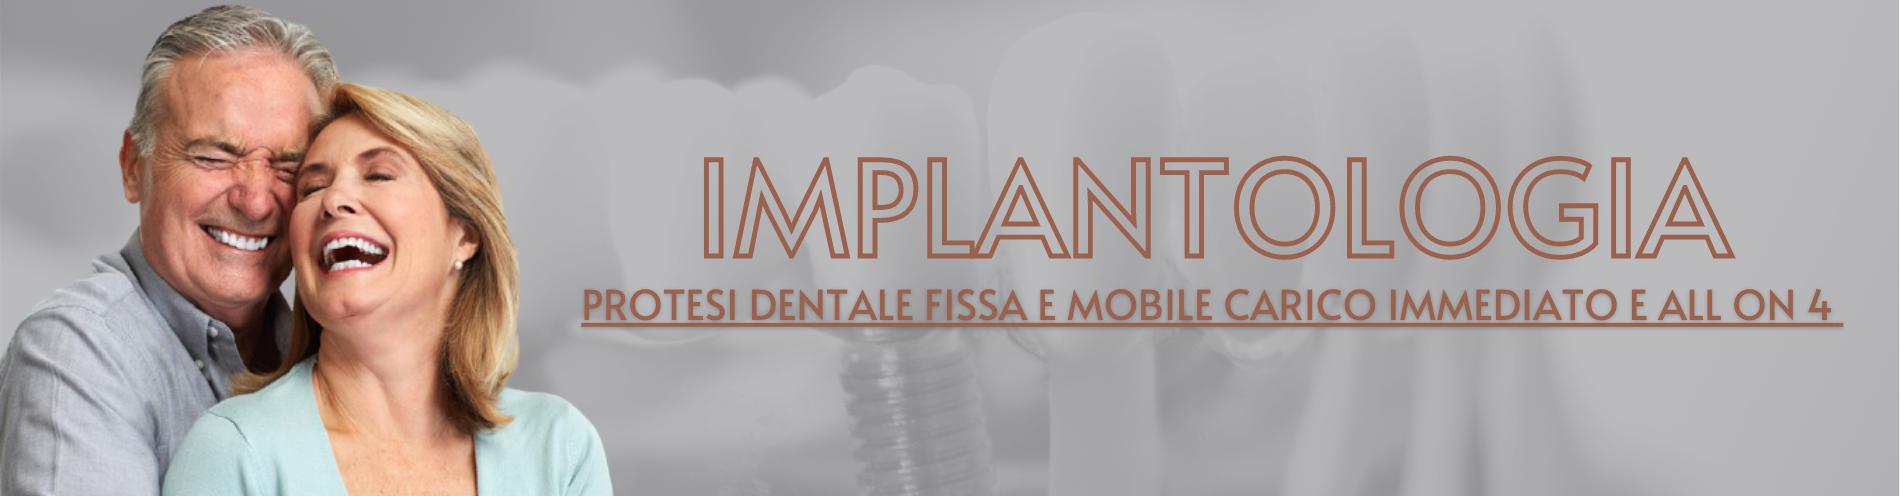 implantologia - impianti dentali